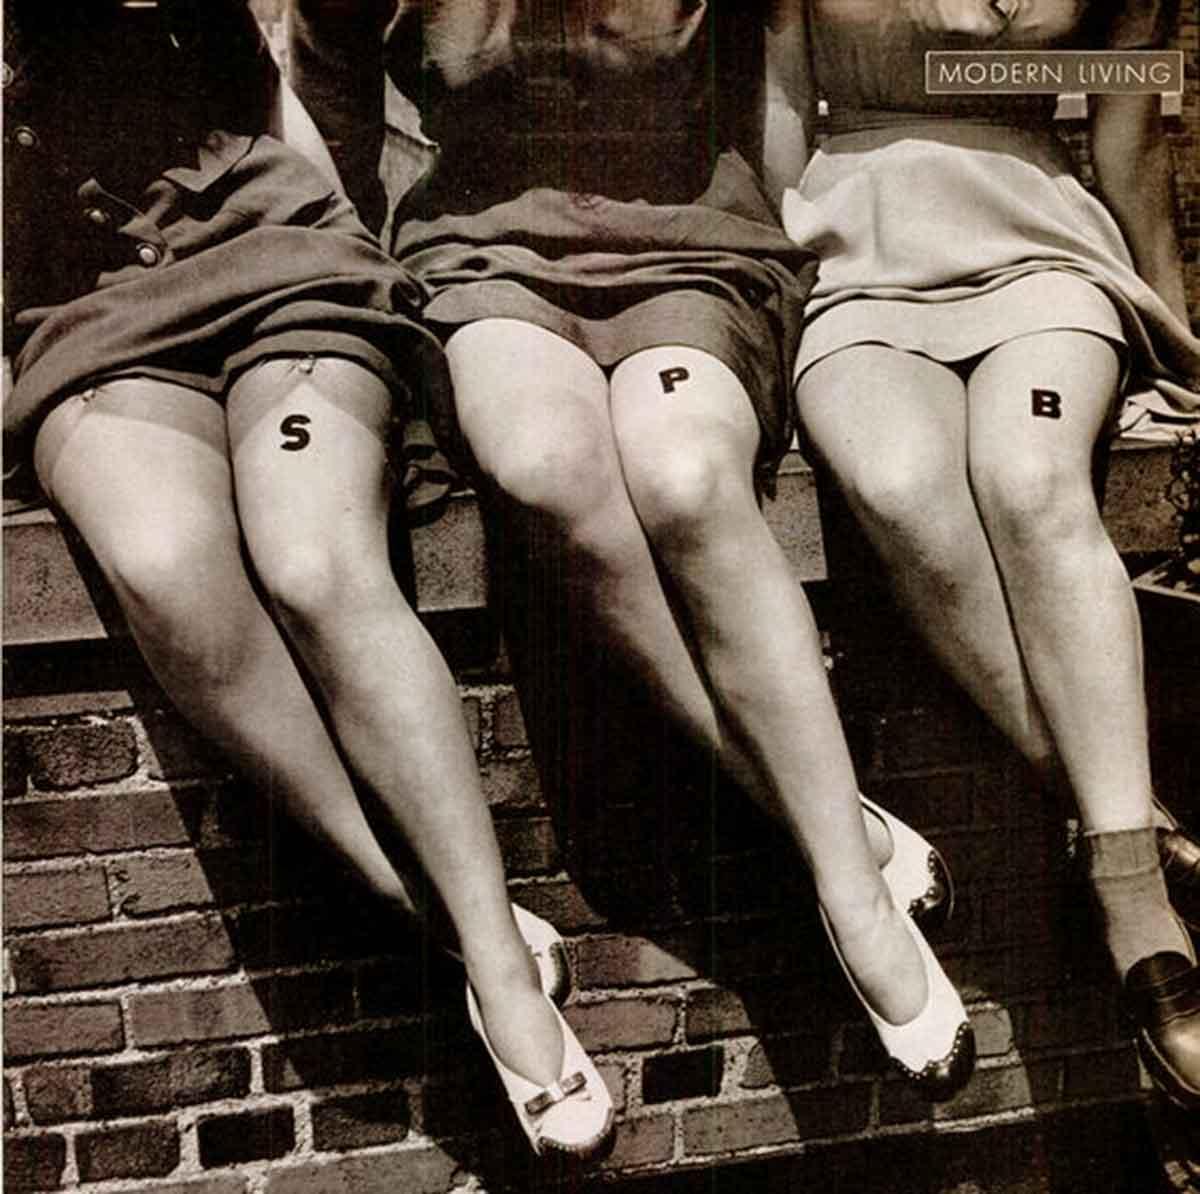 1940s-Fashion---Liquid-Stockings-for-Summer